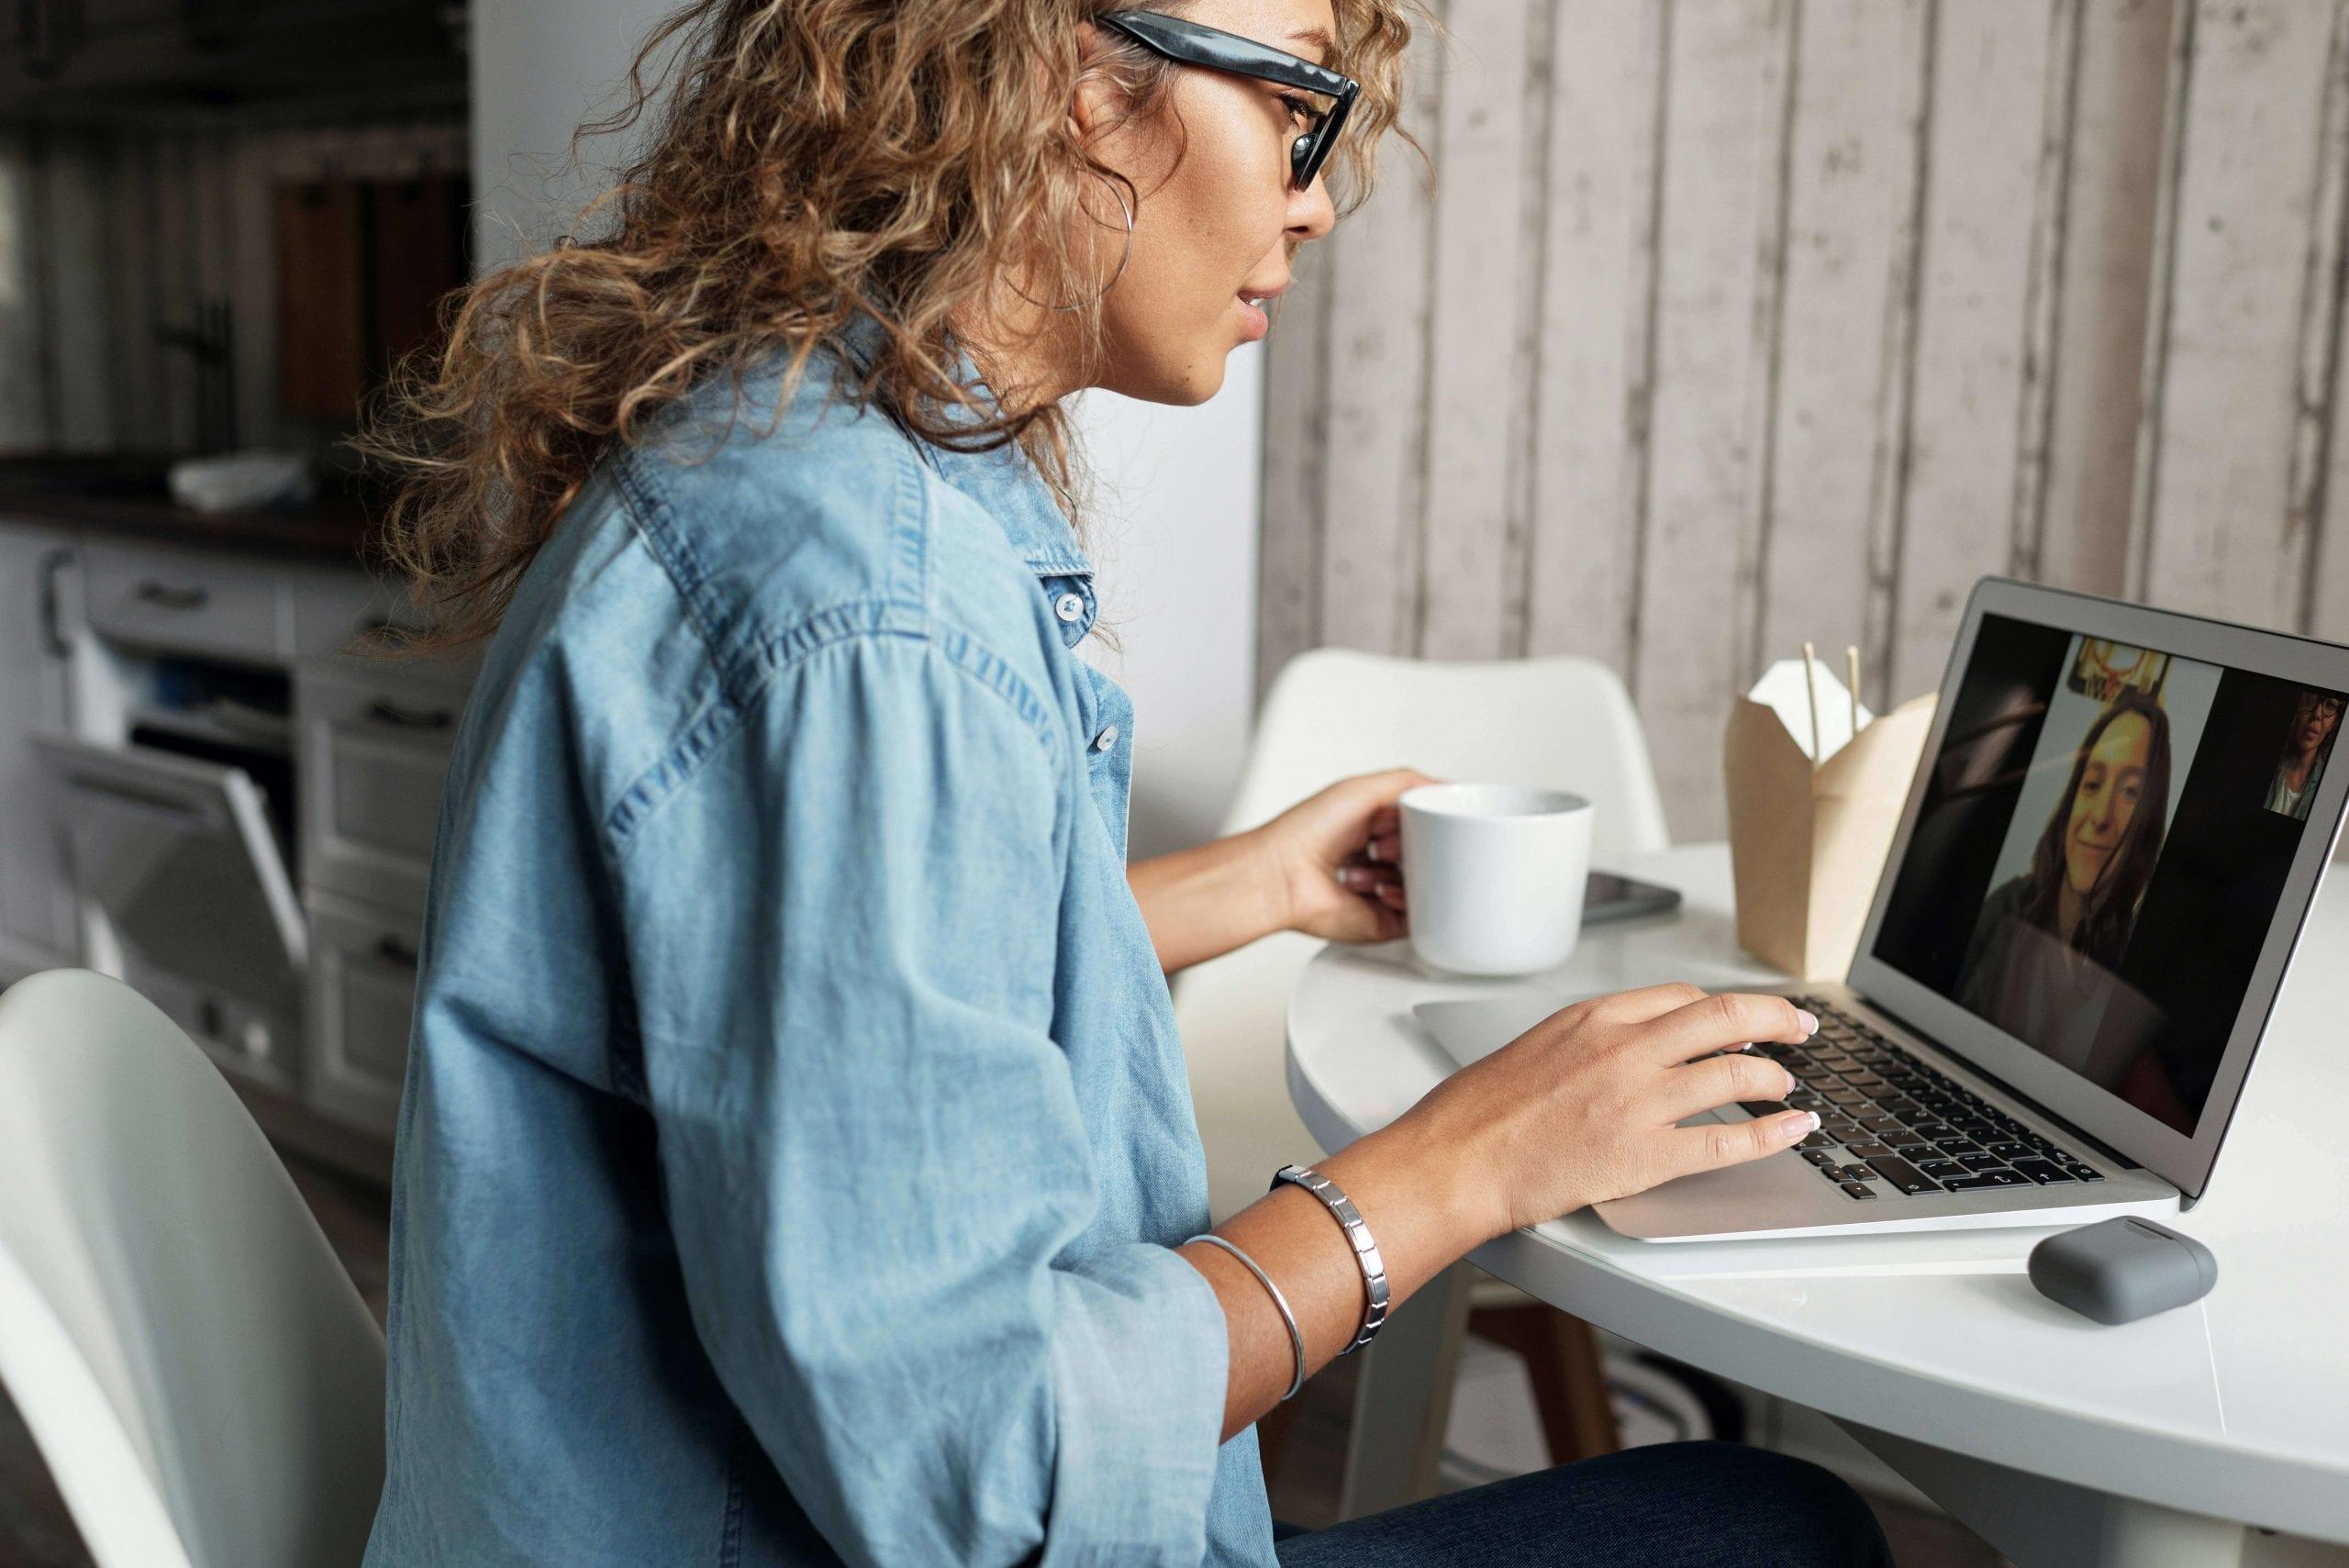 Woman in Blue Denim Jacket Using Macbook Pro